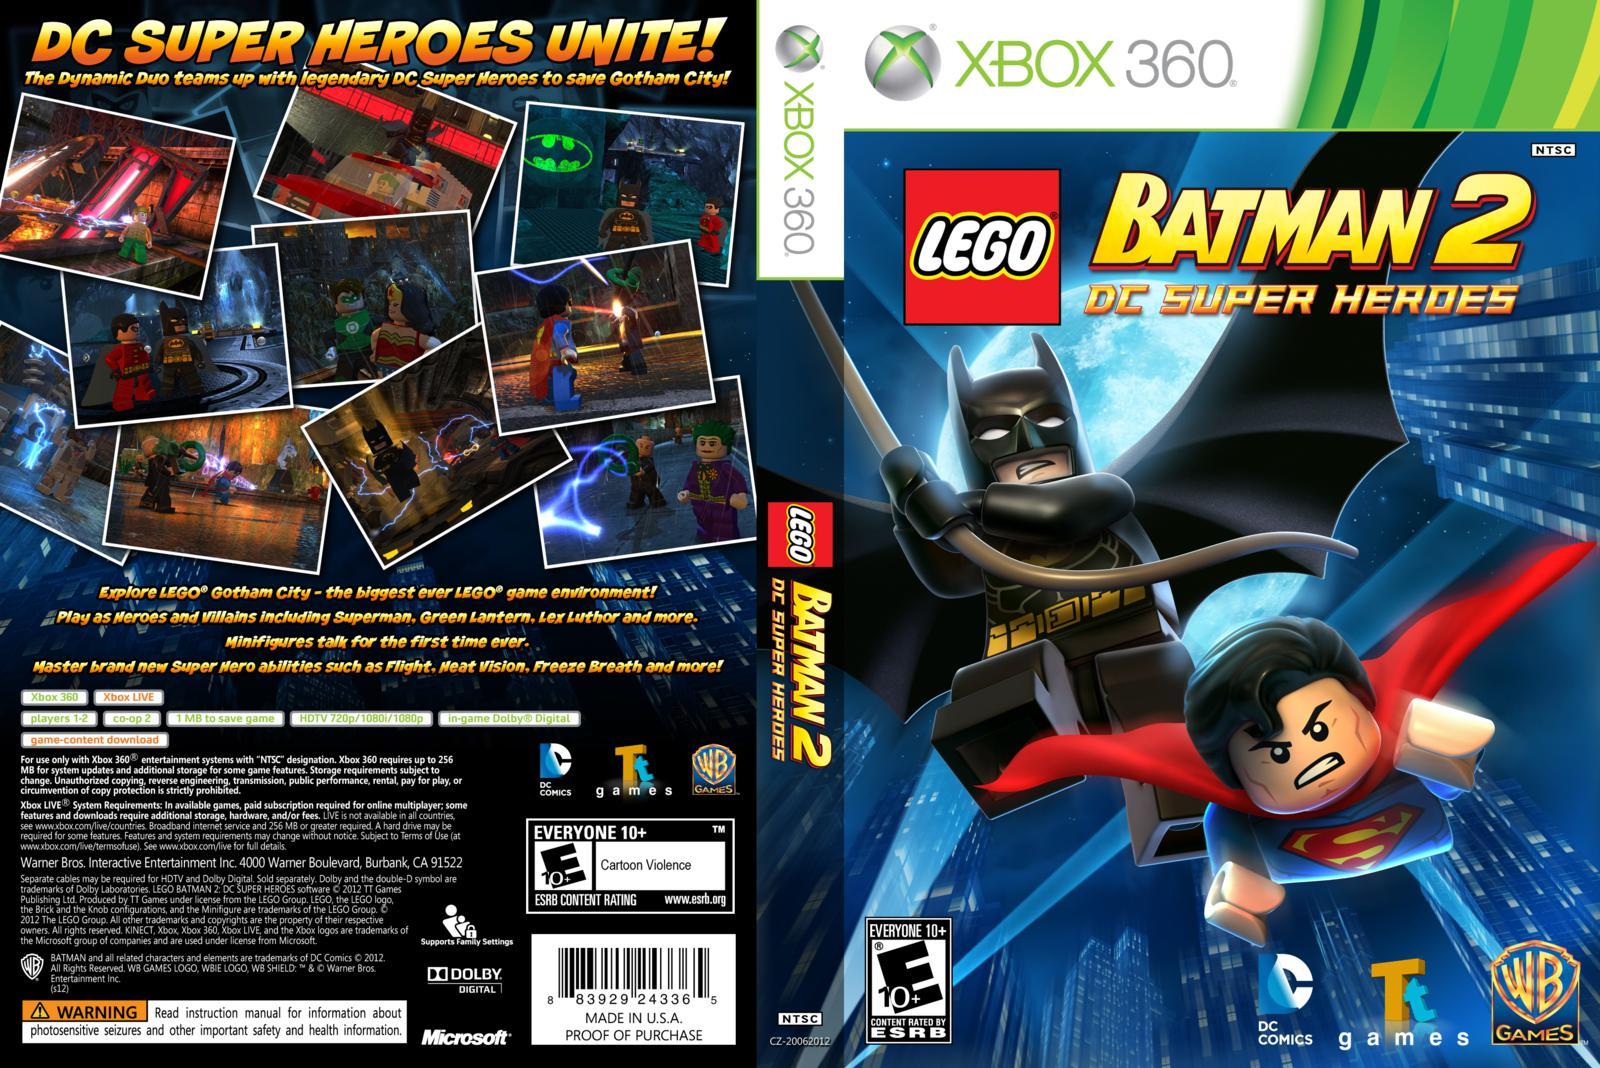 LEGO BATMAN 2 DC SUPER HEROES - xboxbrasil360